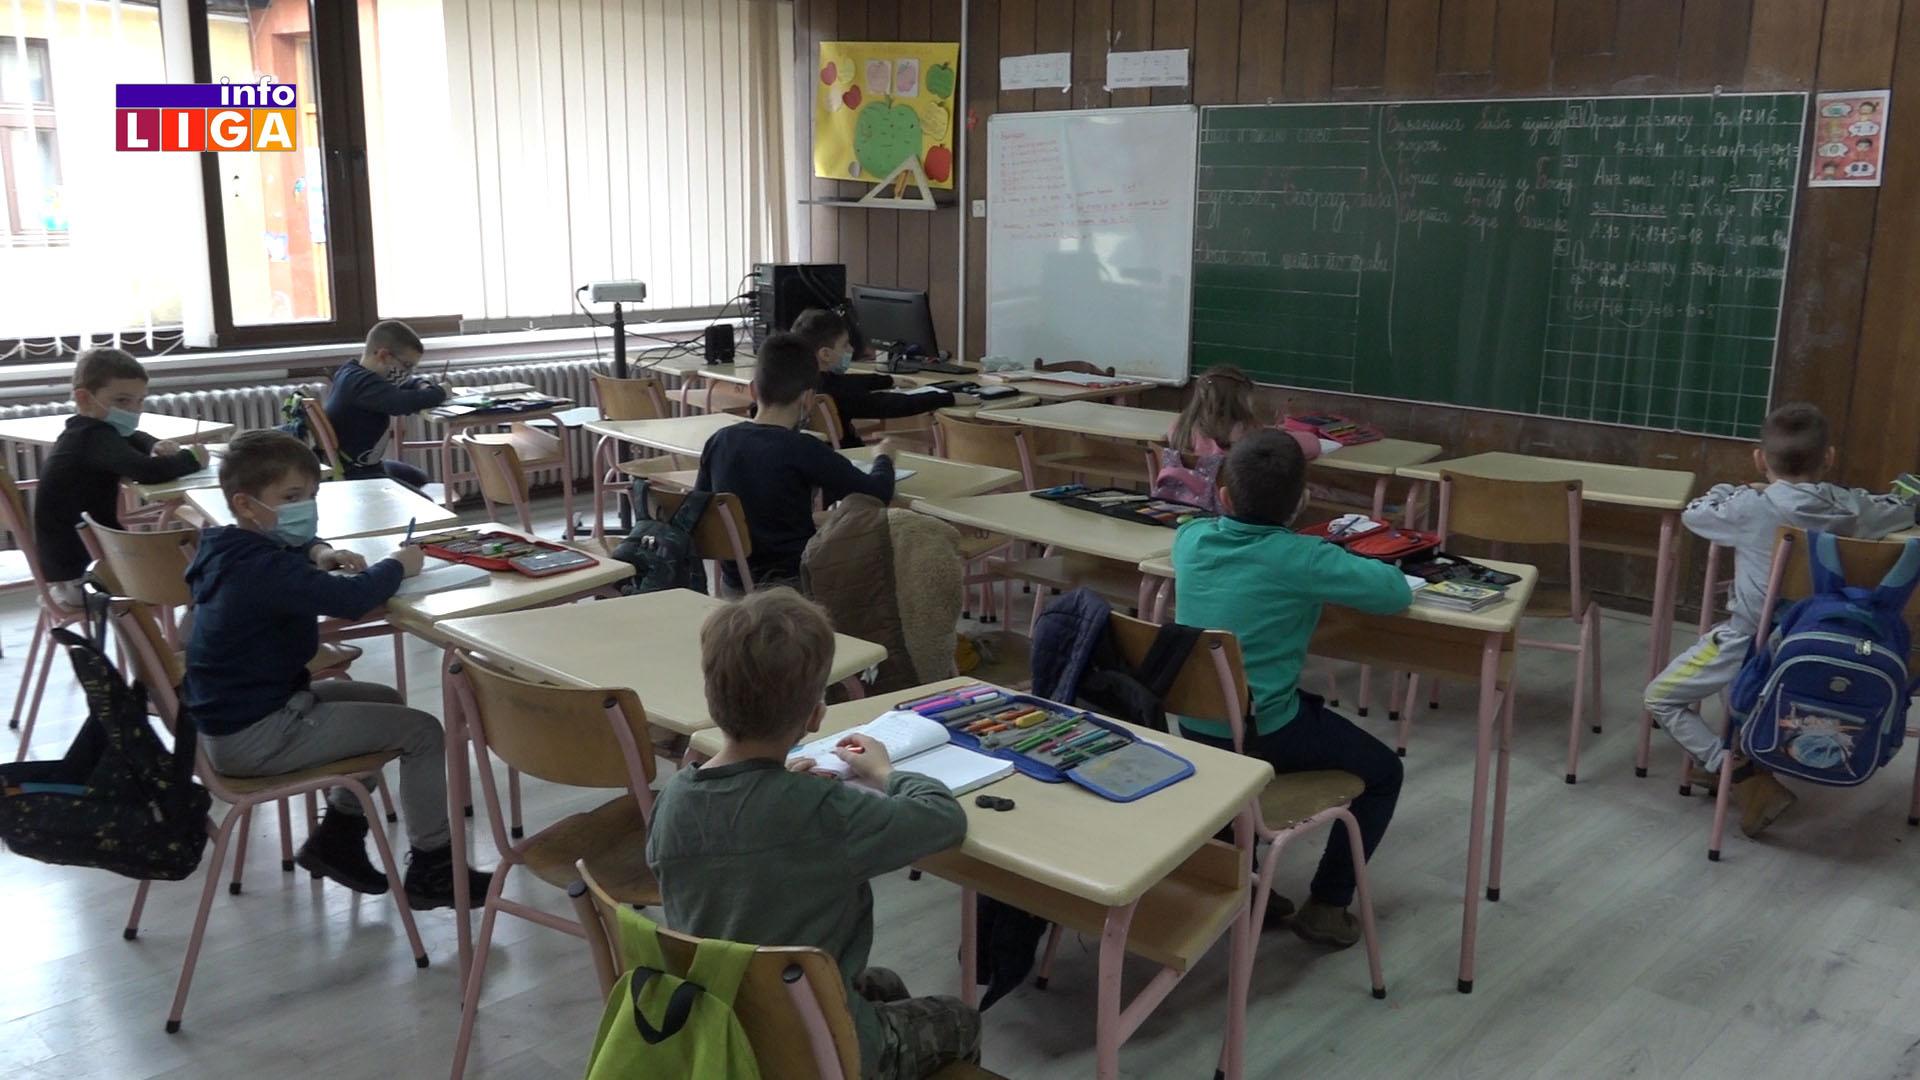 IL-prvaci Počinje online upis prvaka u školu (VIDEO)